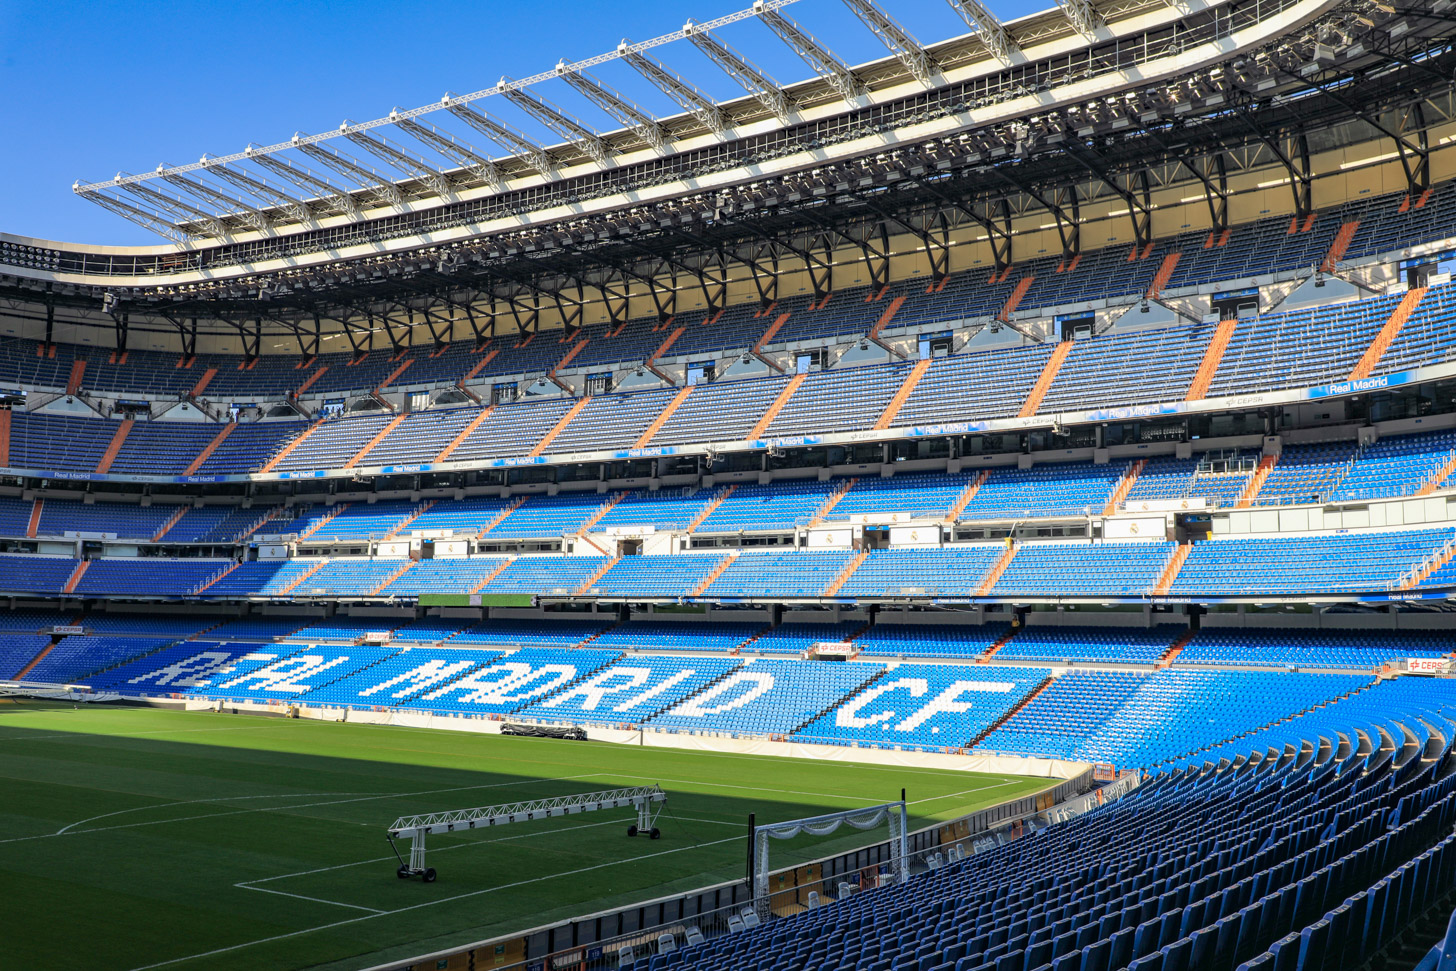 Estadio Santiago Bernabéu: het stadion van Real Madrid